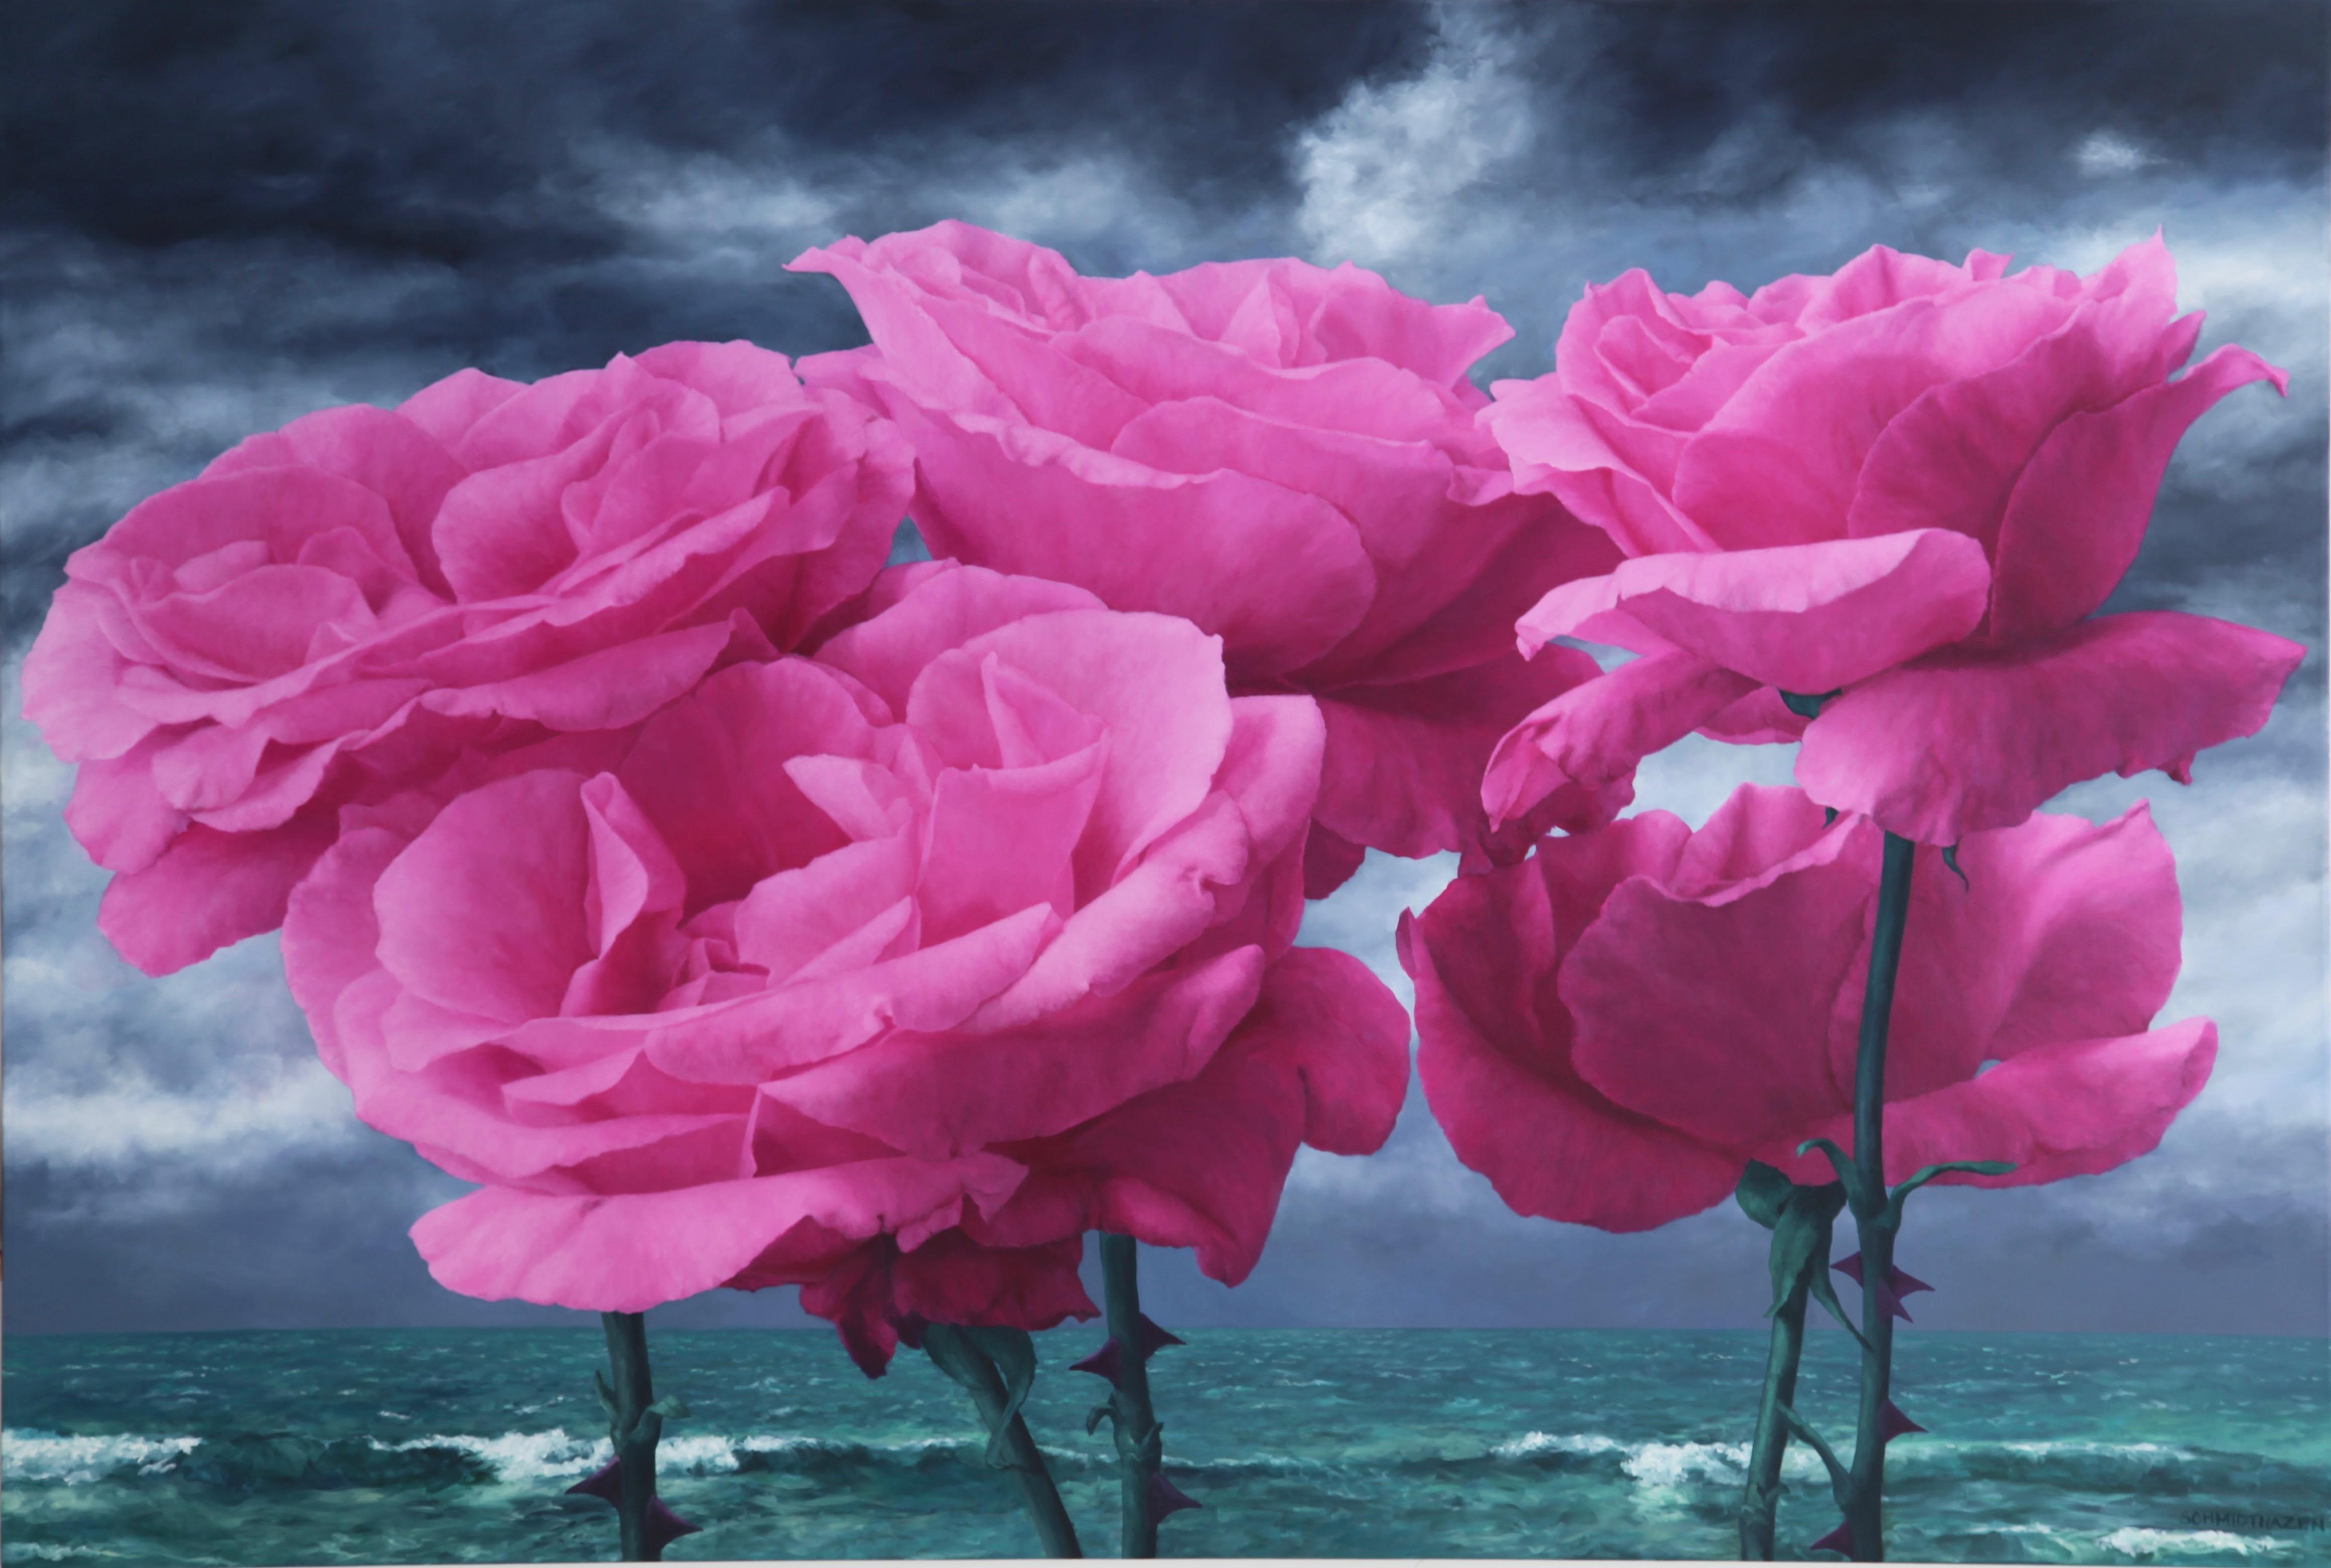 5 giant pink roses horizontal very stormy dark blue sky stormy acid green sea